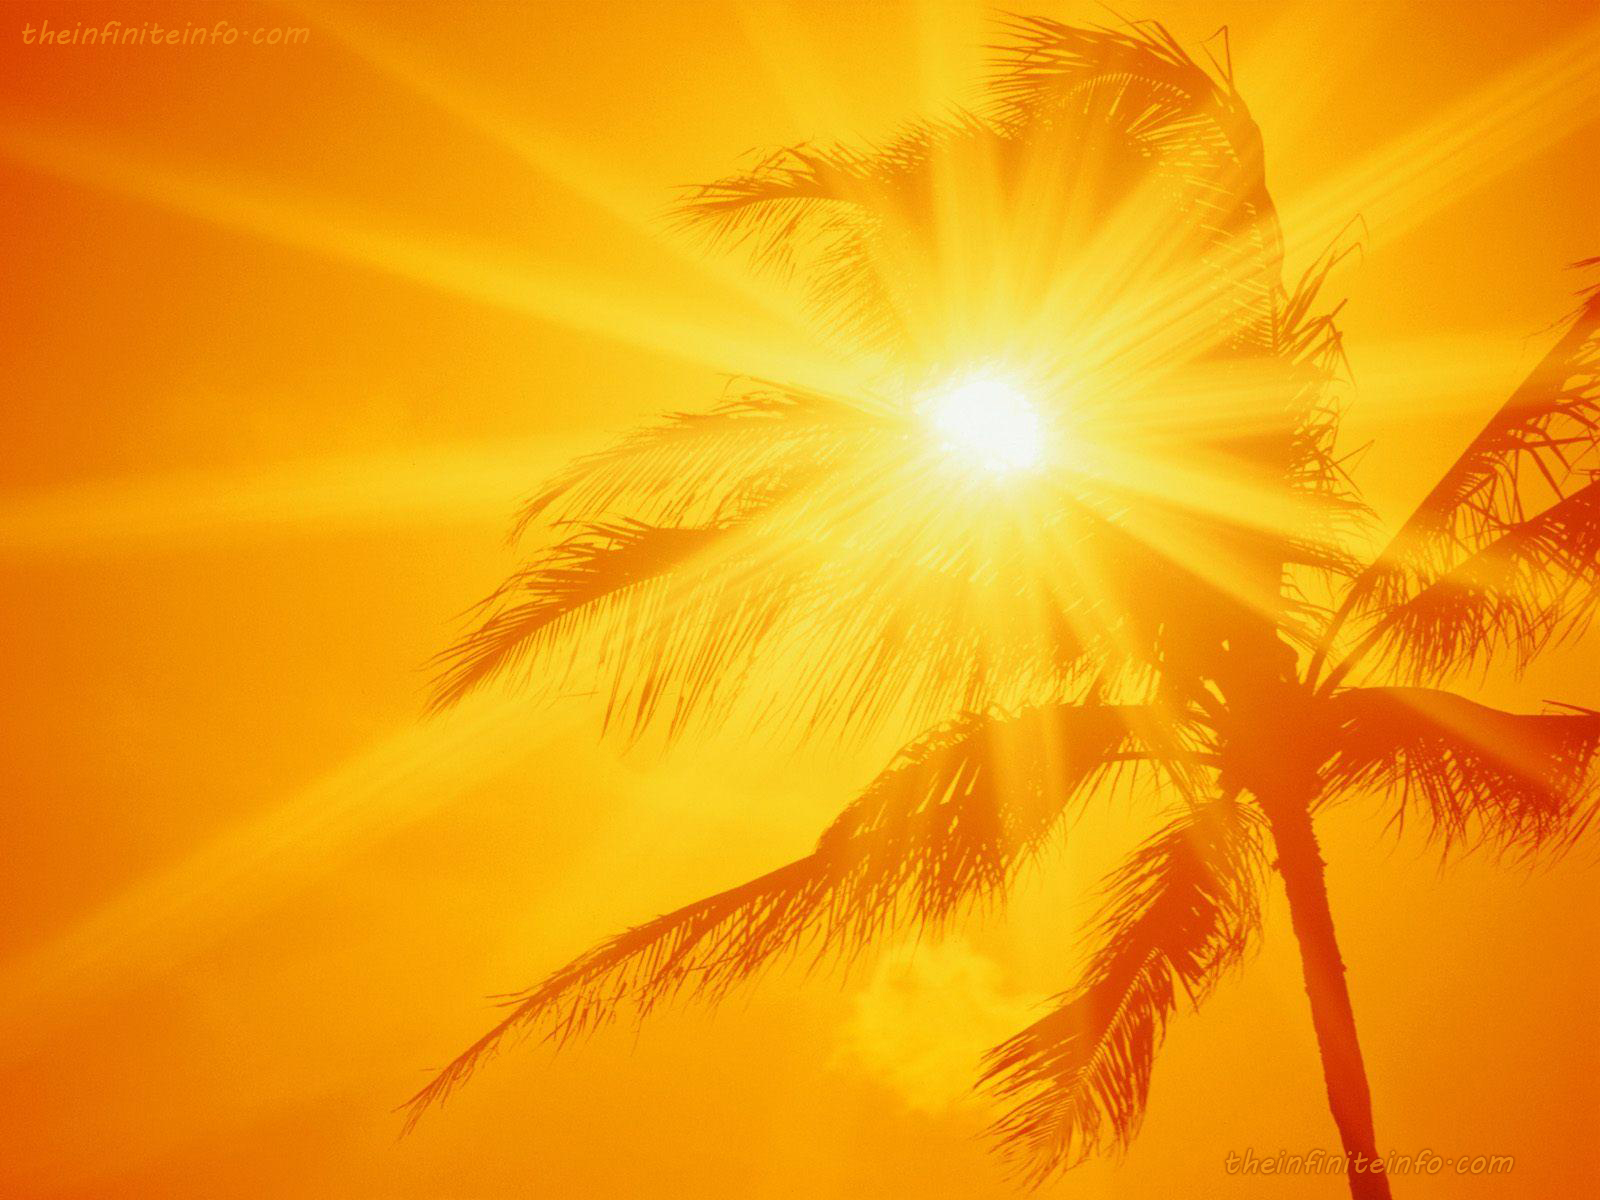 http://2.bp.blogspot.com/-znpoVk3gcEg/T_6QlvCpVXI/AAAAAAAAAtU/Xg-snOKOCjo/s1600/sunshine_yellow_1600x1200.jpg